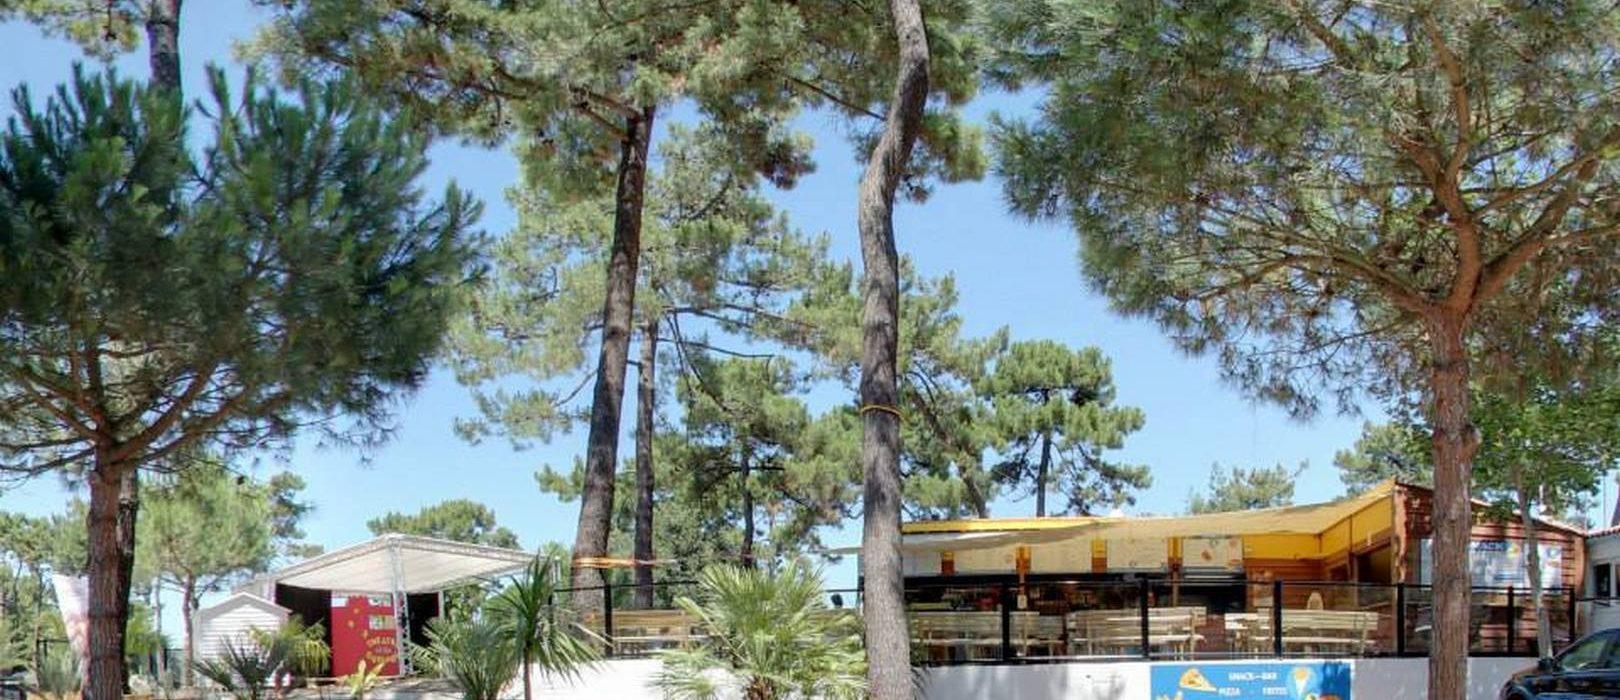 Snack-bar au Camping-club les pins d'Oléron